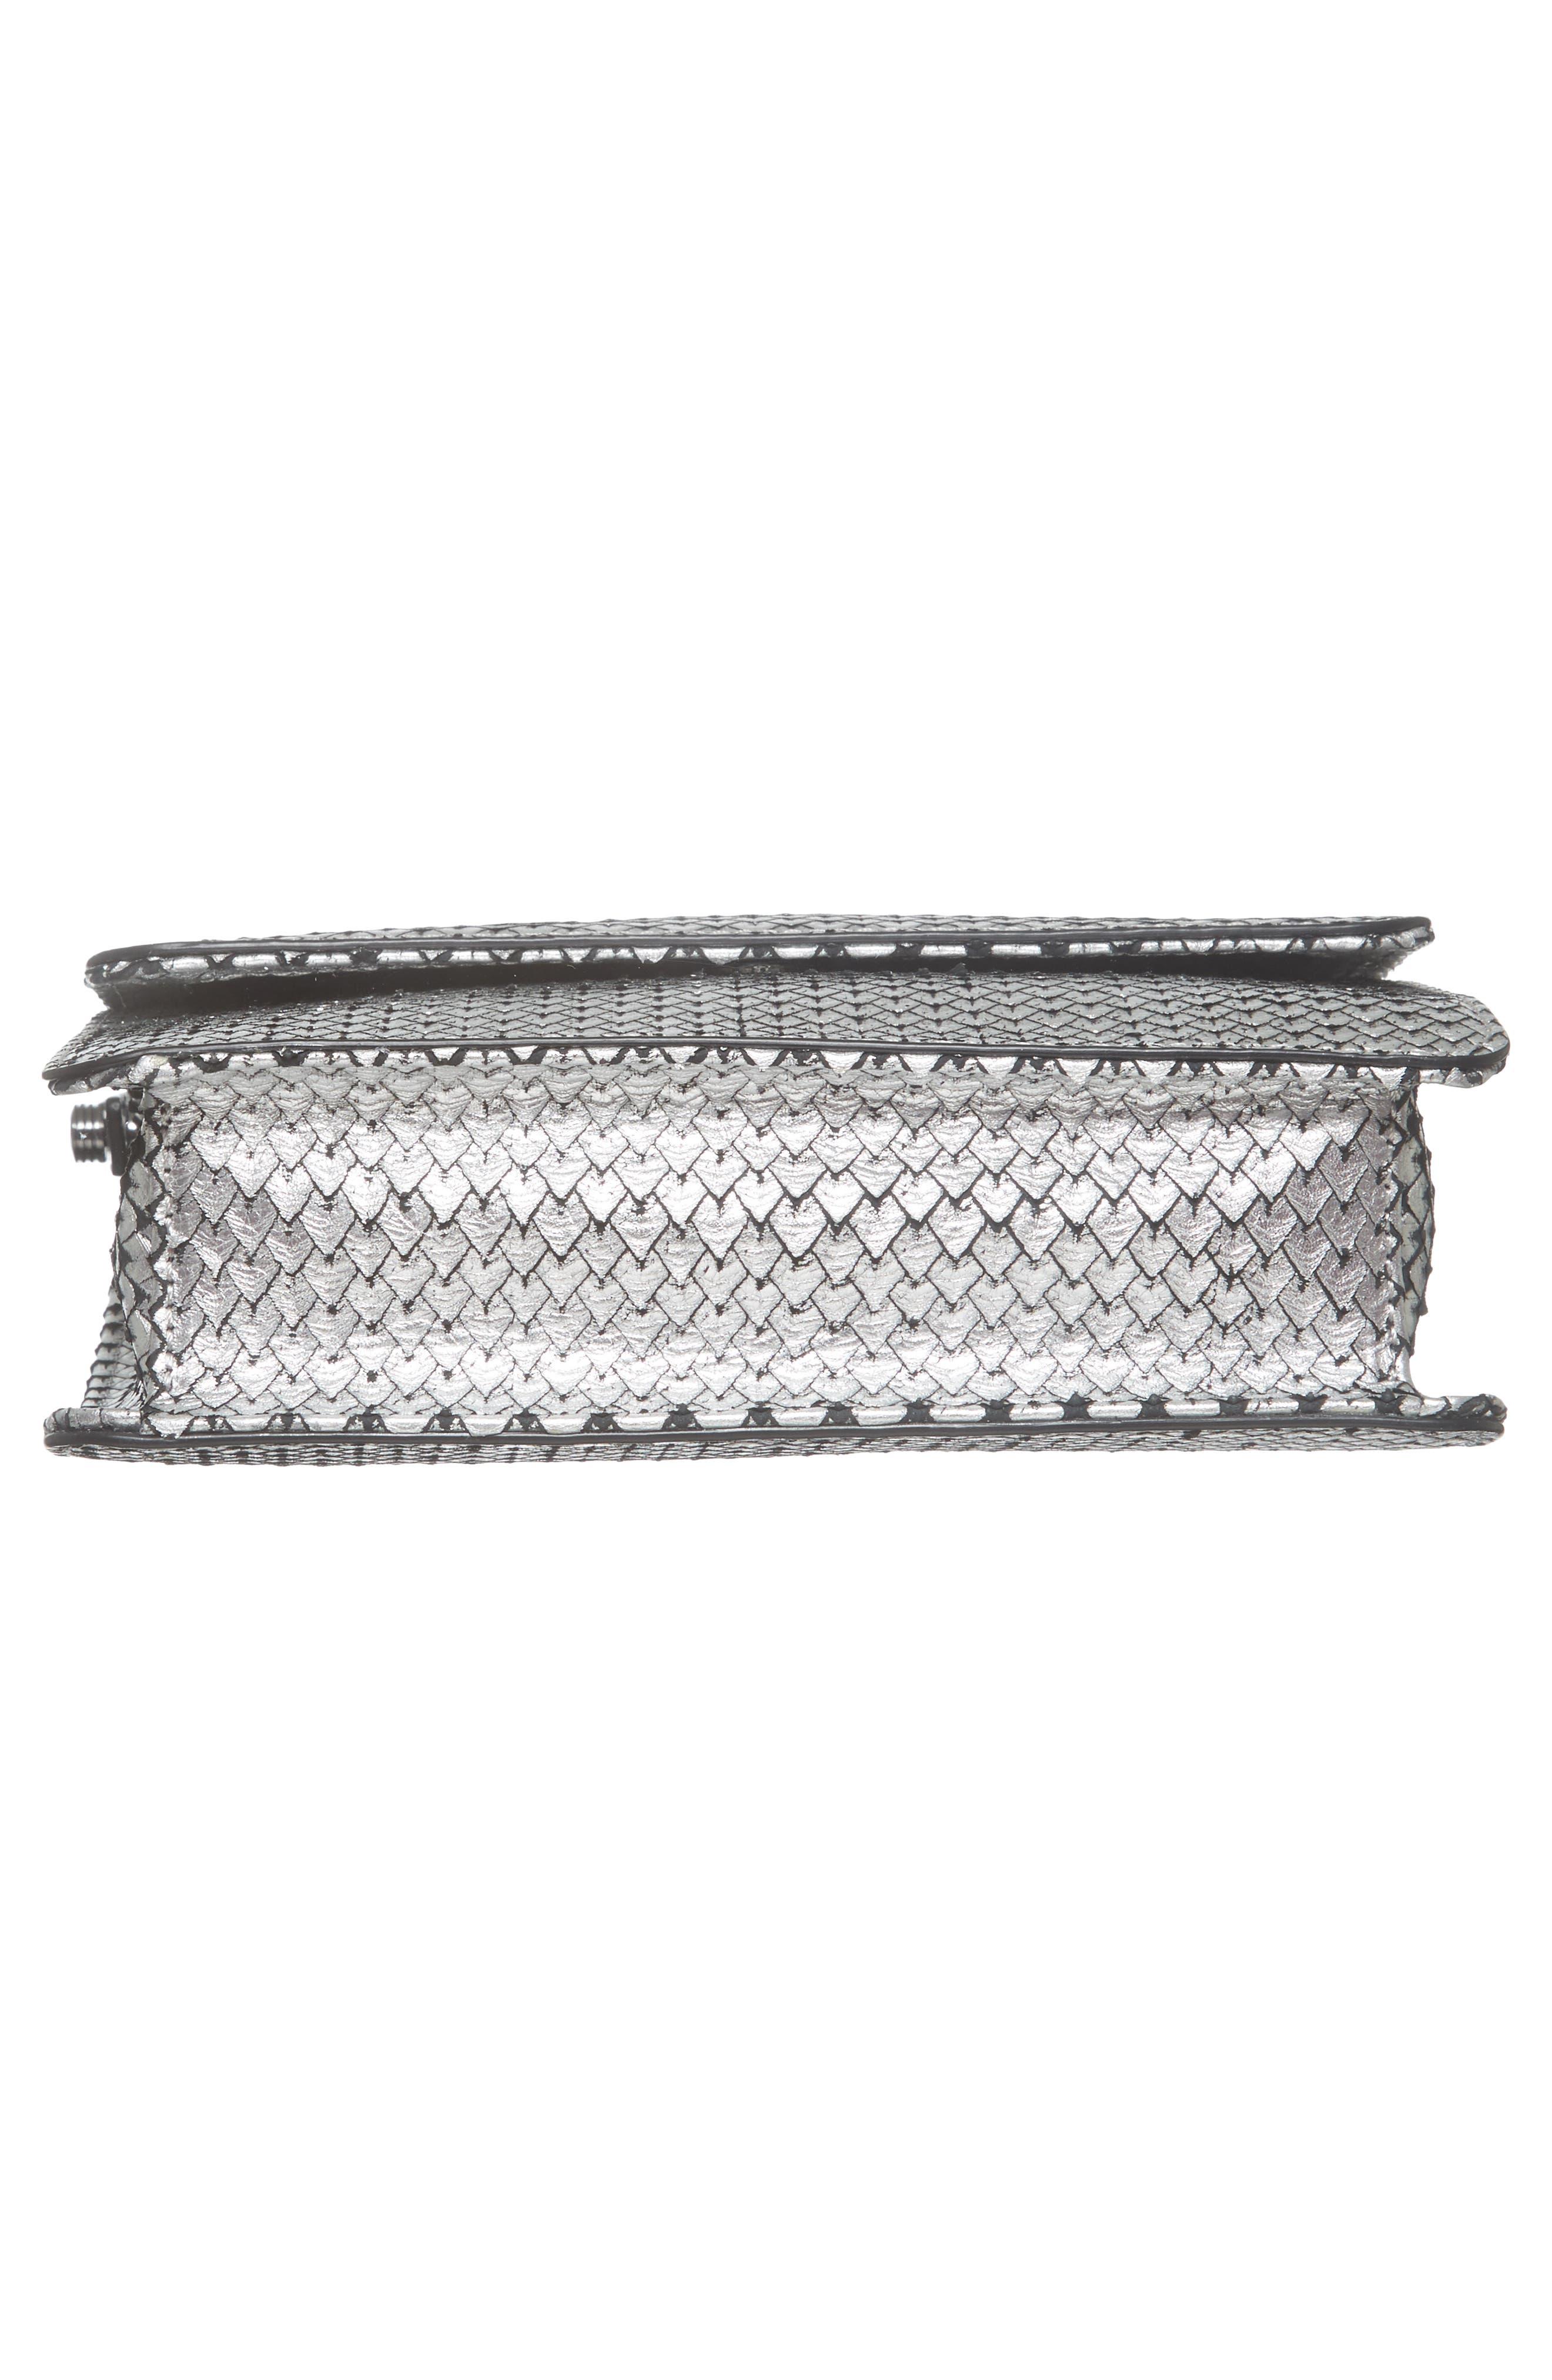 Crawford Calfskin Leather Crossbody Bag,                             Alternate thumbnail 17, color,